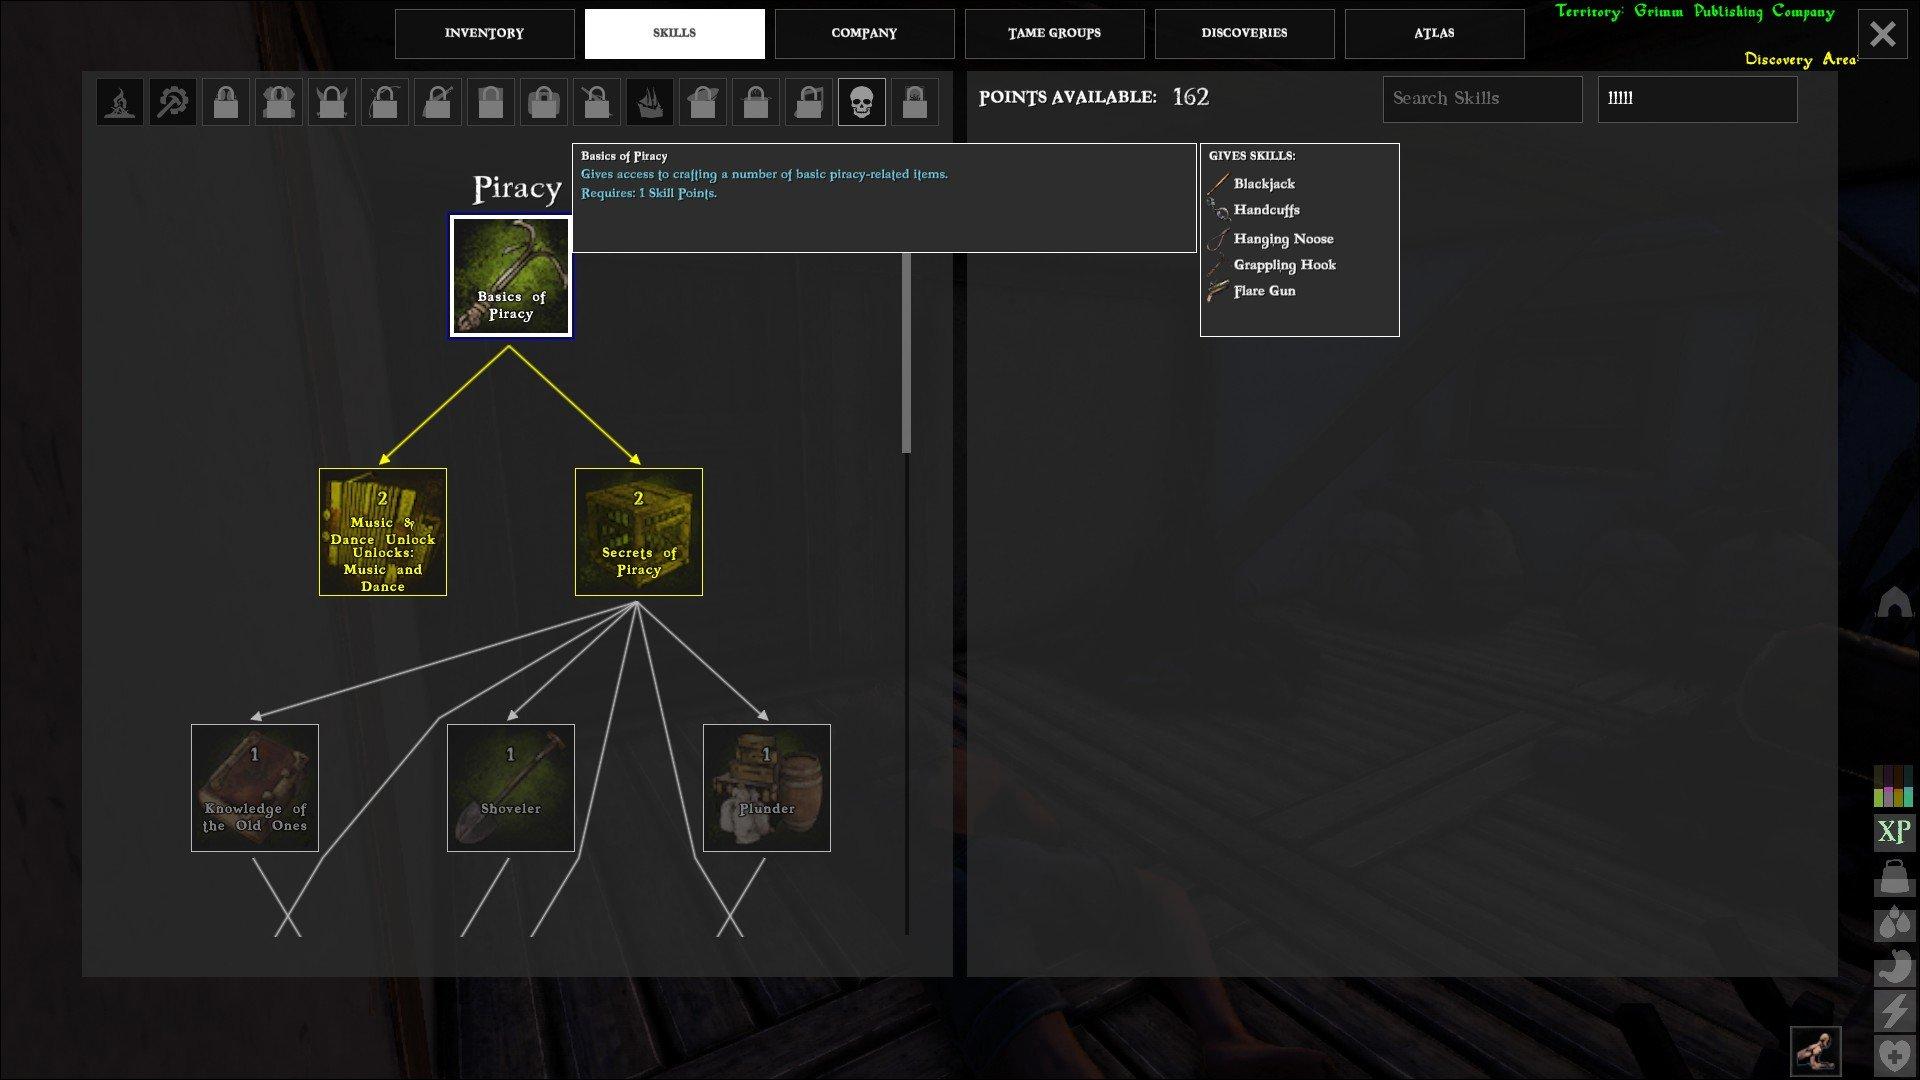 Atlas unlock Basics of Piracy Skill